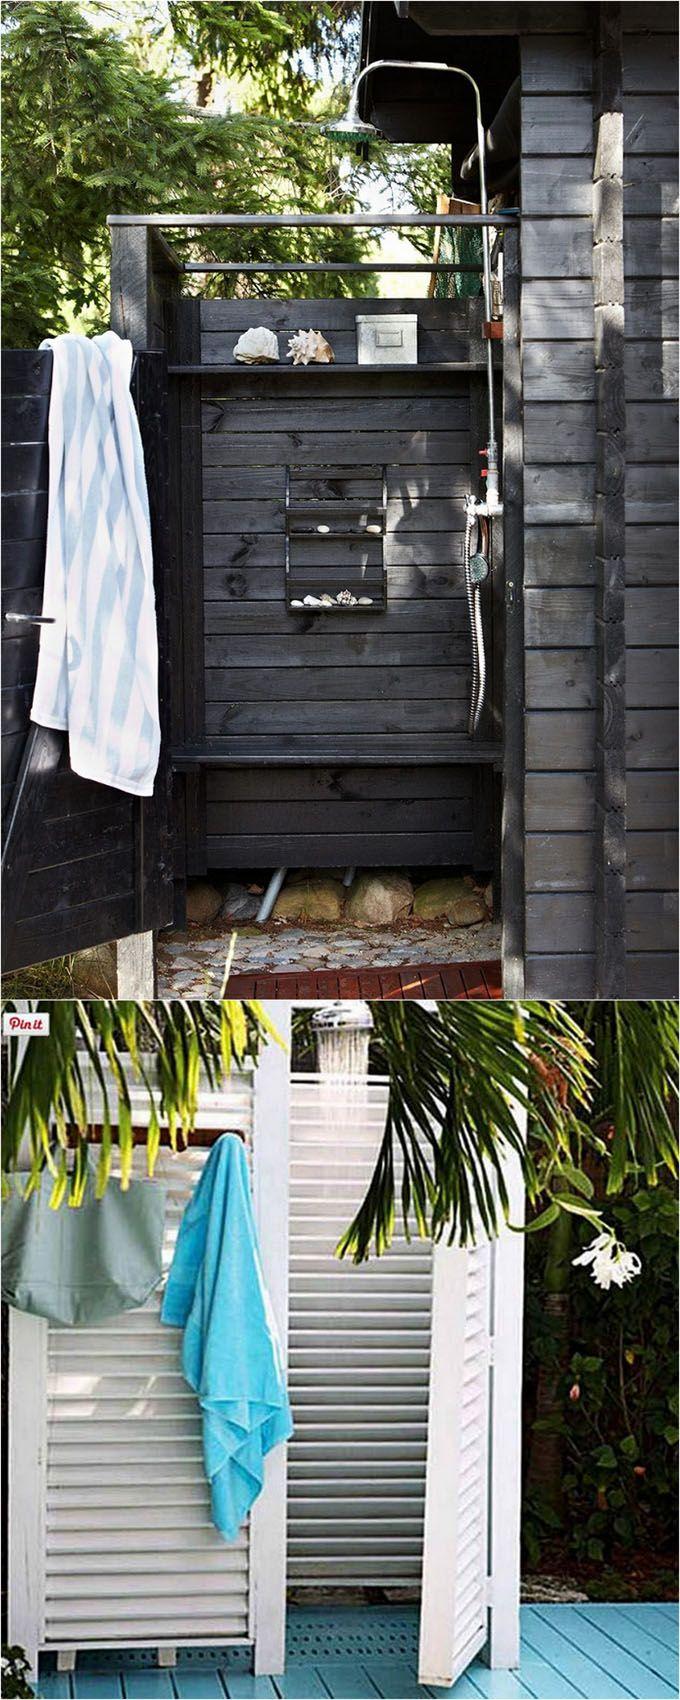 Best 25+ Shower fixtures ideas on Pinterest | Showers interior ...